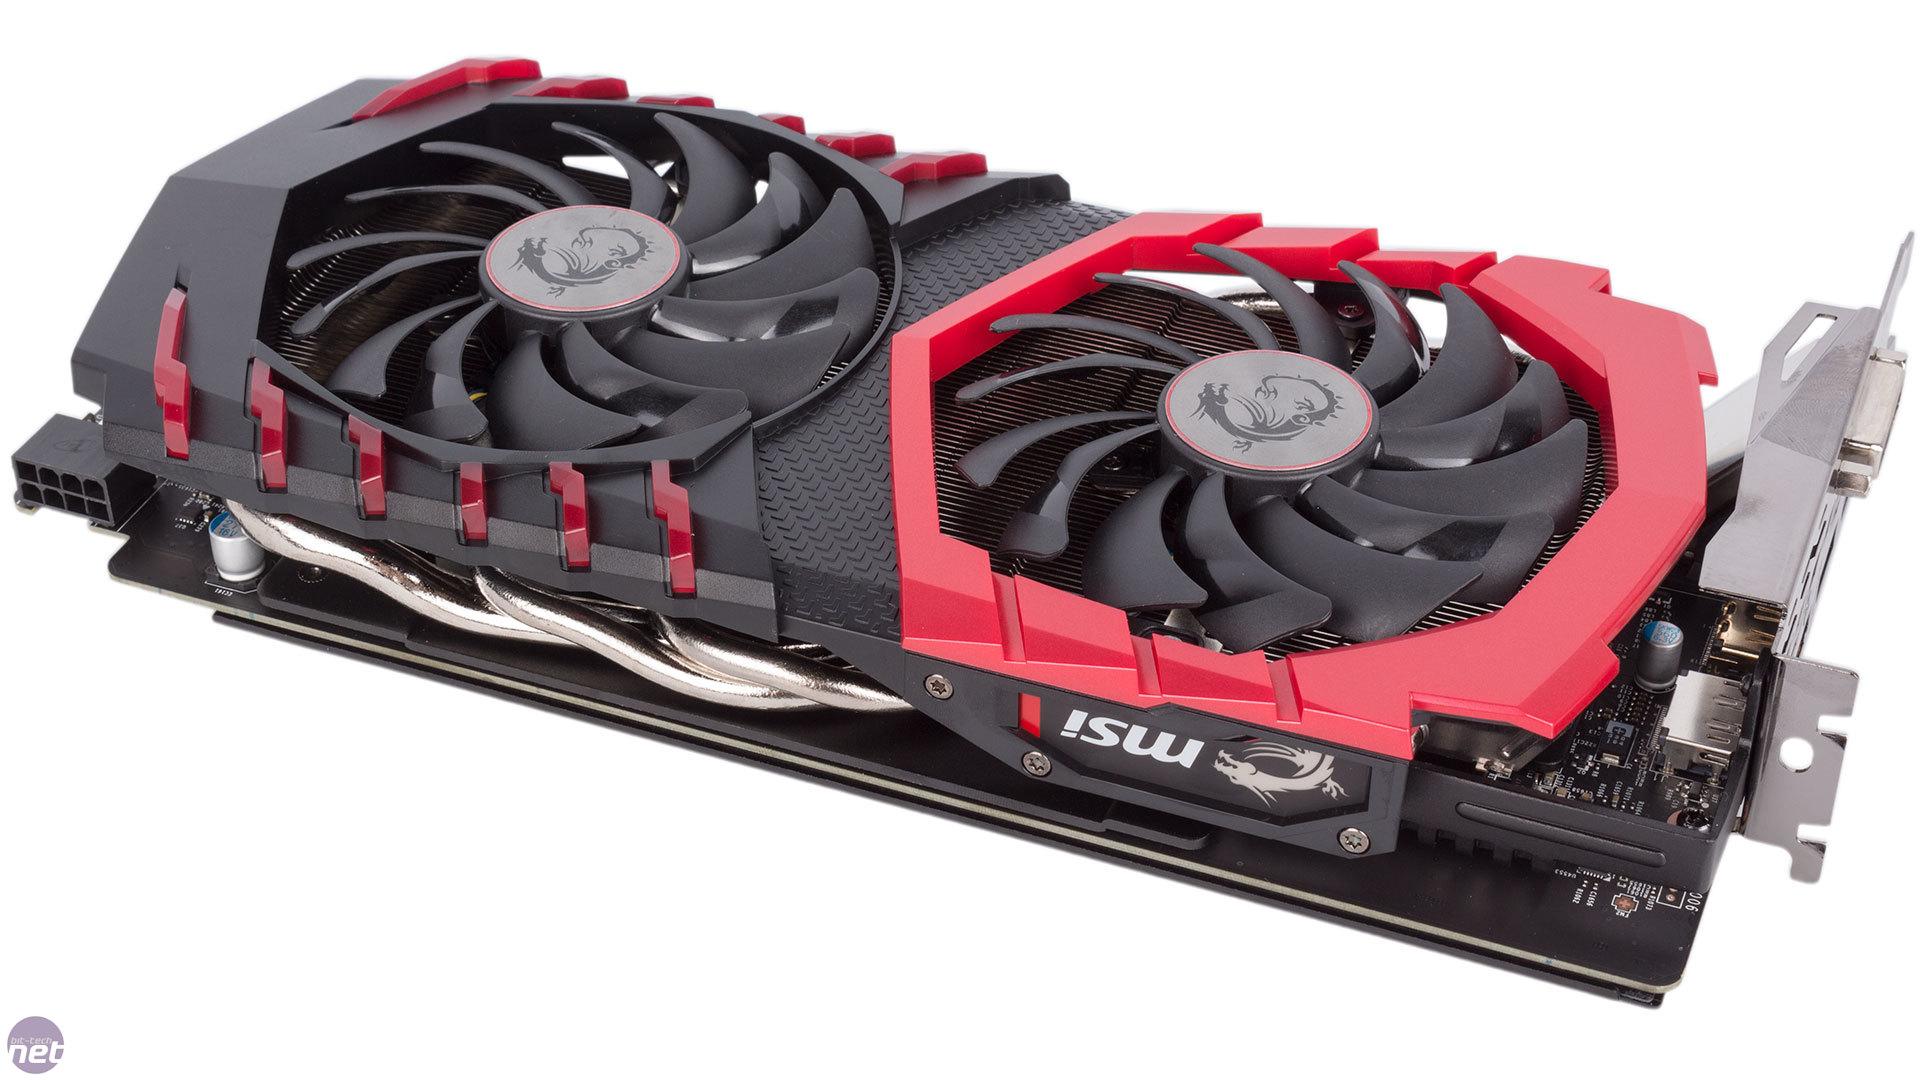 MSI GeForce GTX 1060 Gaming X 6G Review   bit-tech.net